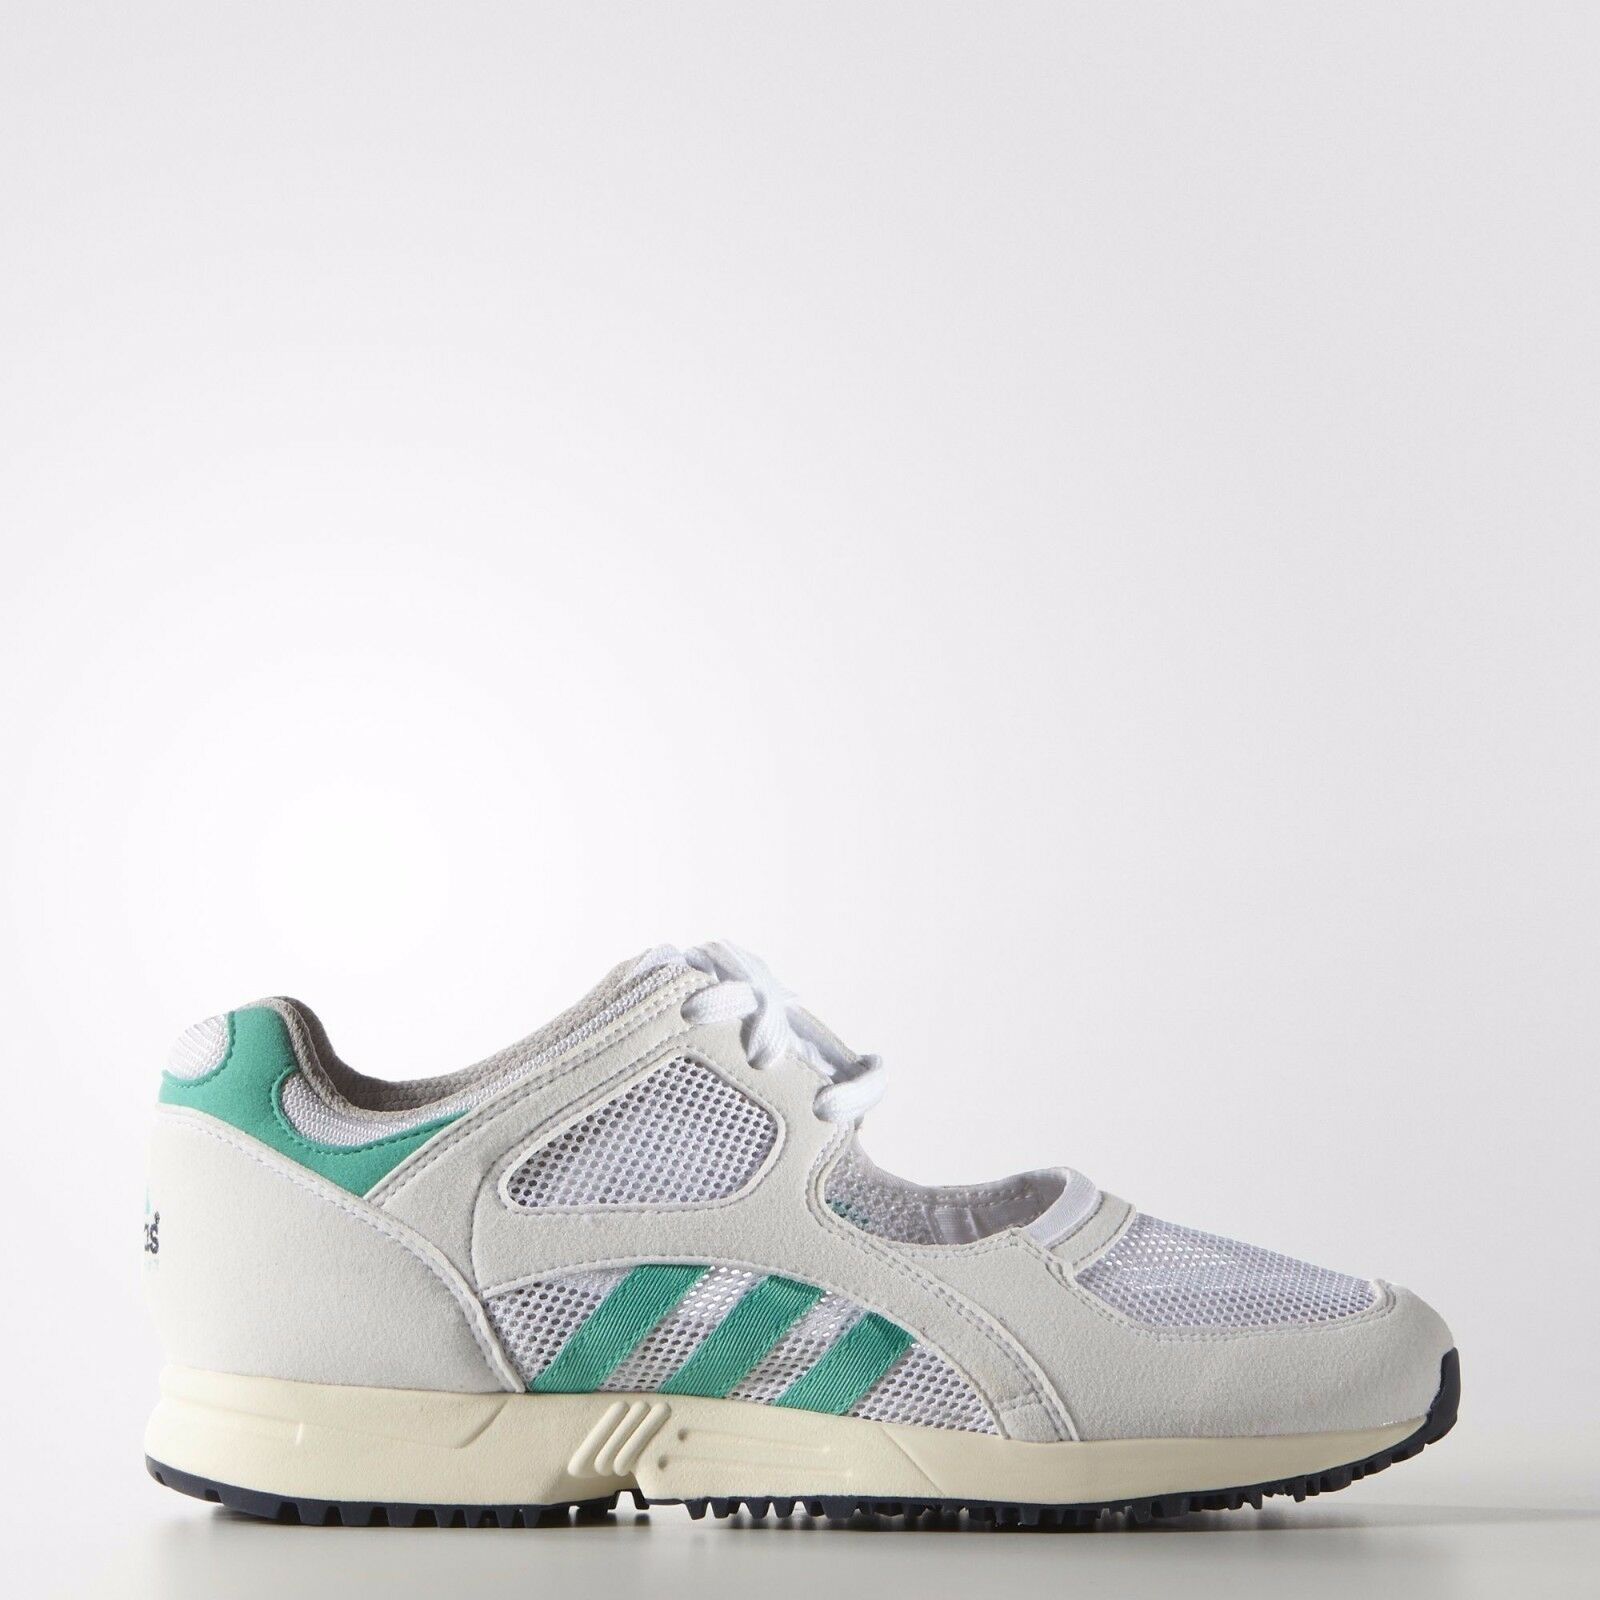 Adidas Originals EQT Equipment Racing OG S78857 Women's RARE Limited Edition